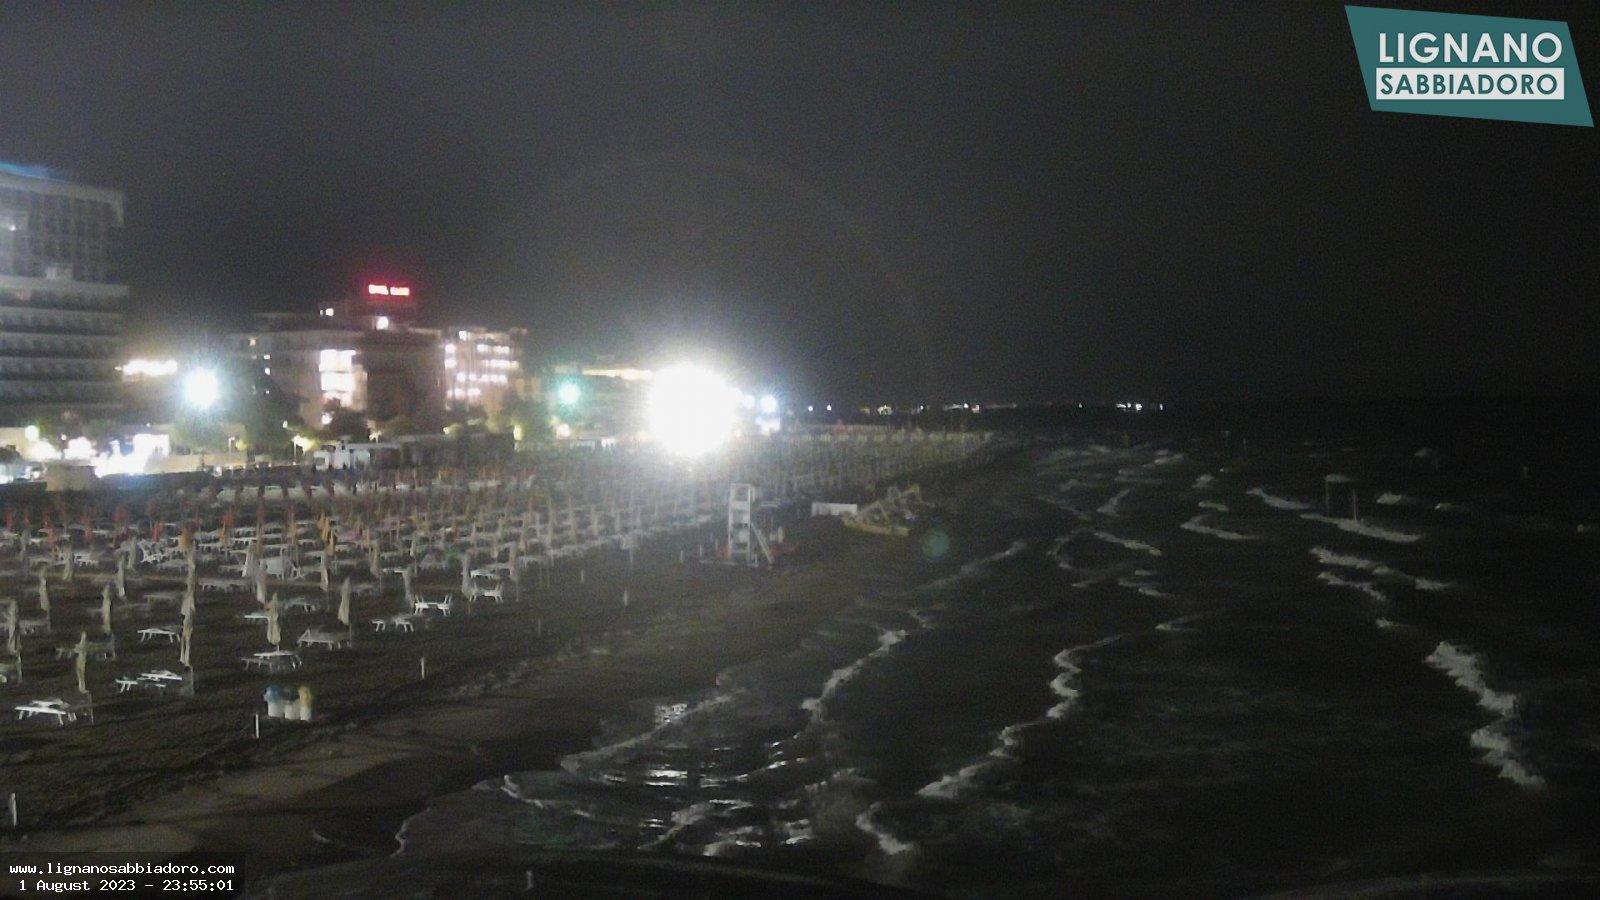 Webcam a Lignano Sabbiadoro, panoramica su spiaggia VIP